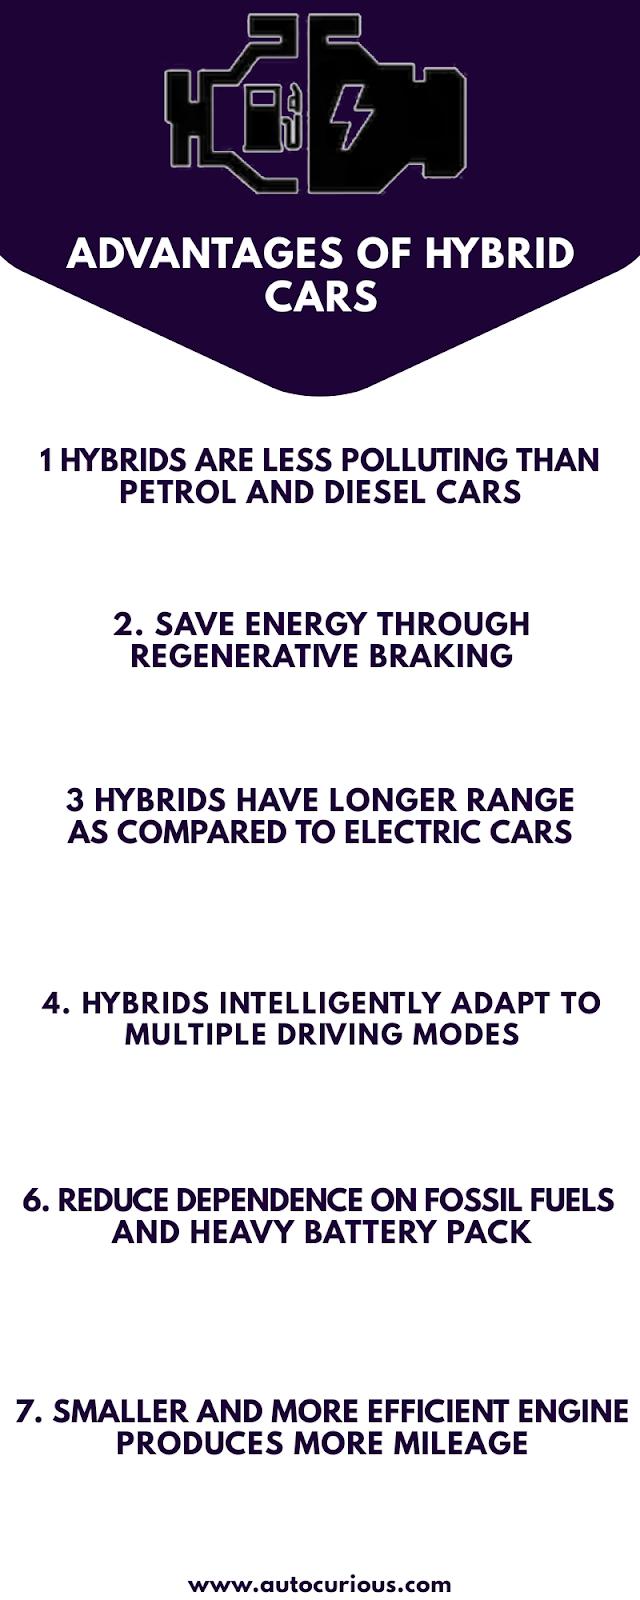 Hybrid Cars Pros And Cons, how hybrid cars work